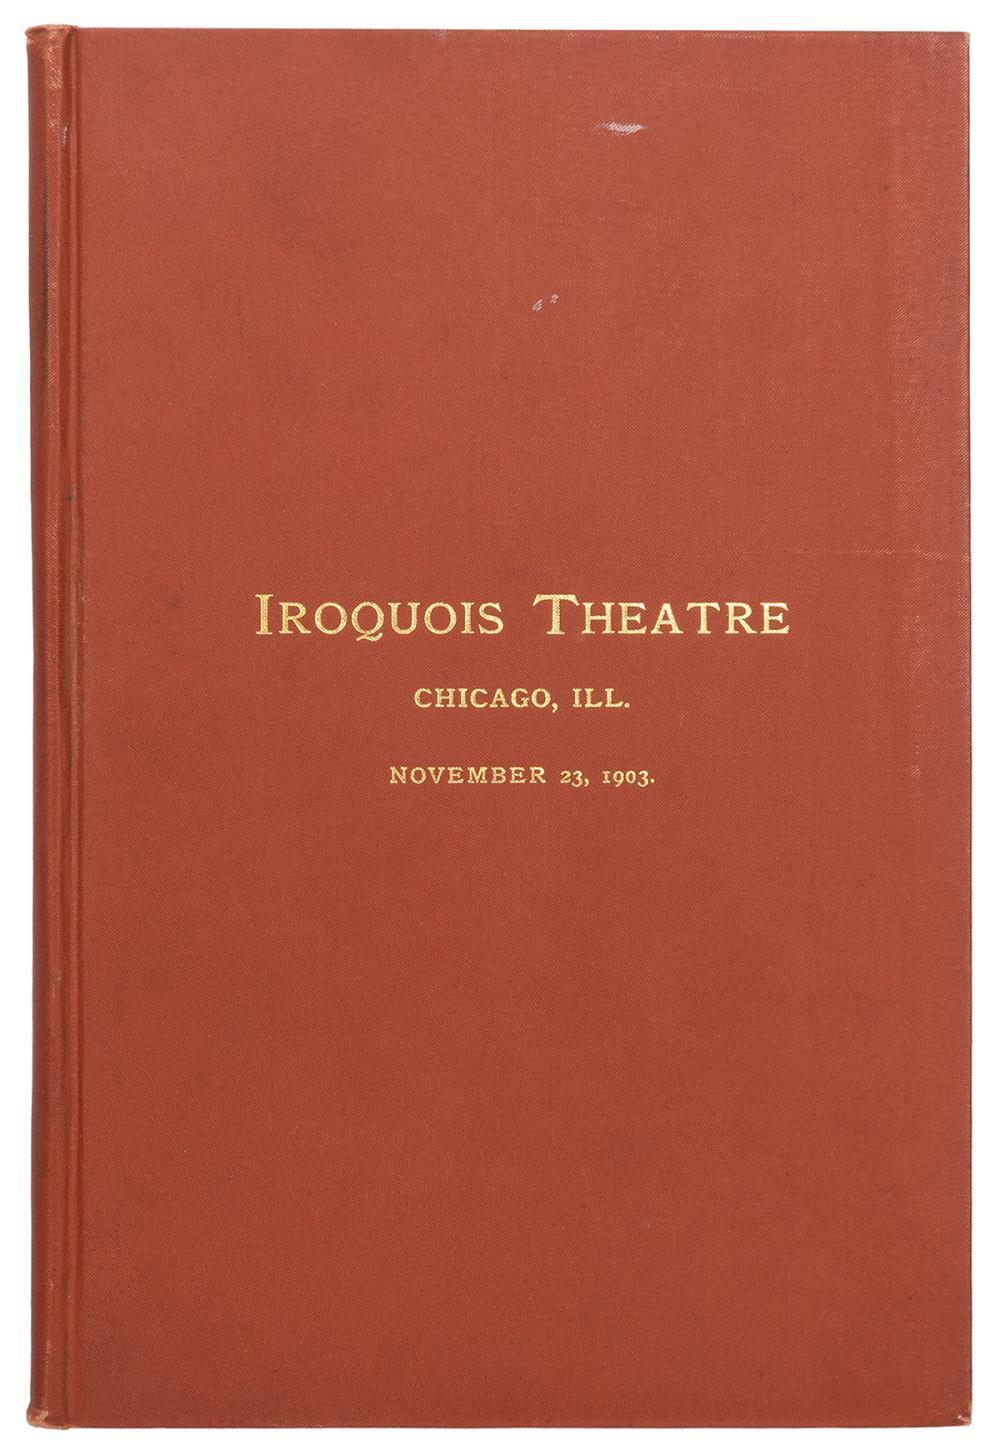 [CHICAGO]. IROQUOIS THEATRE SOUVENIR PROGRAMME. CHICAGO: PR...